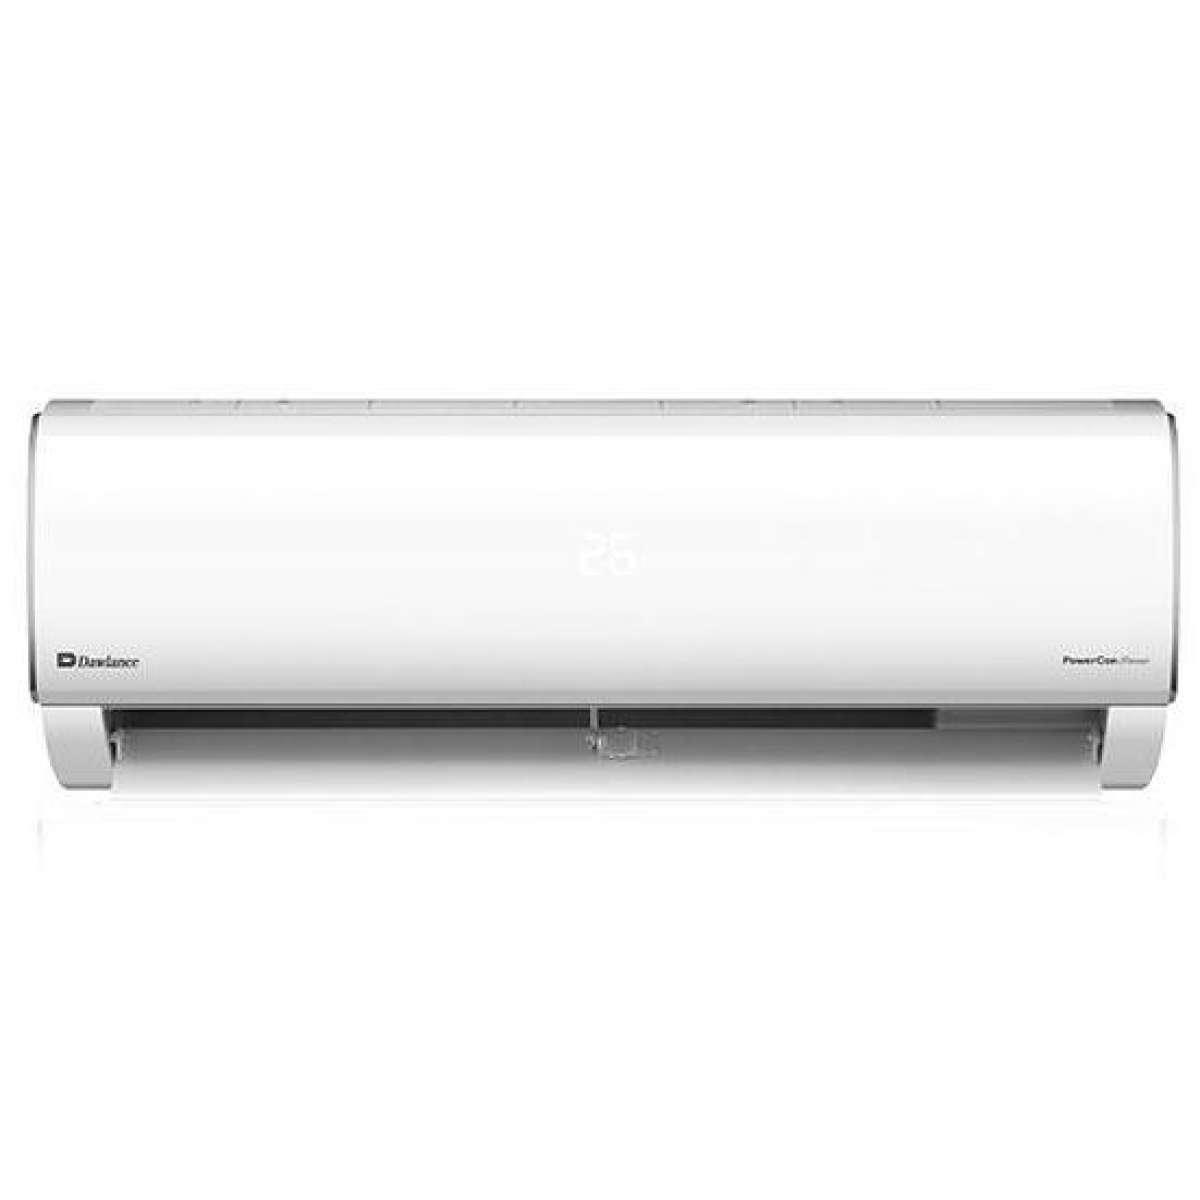 Dawlance Powercon 30 Inverter Air Conditioner 1.5 Ton